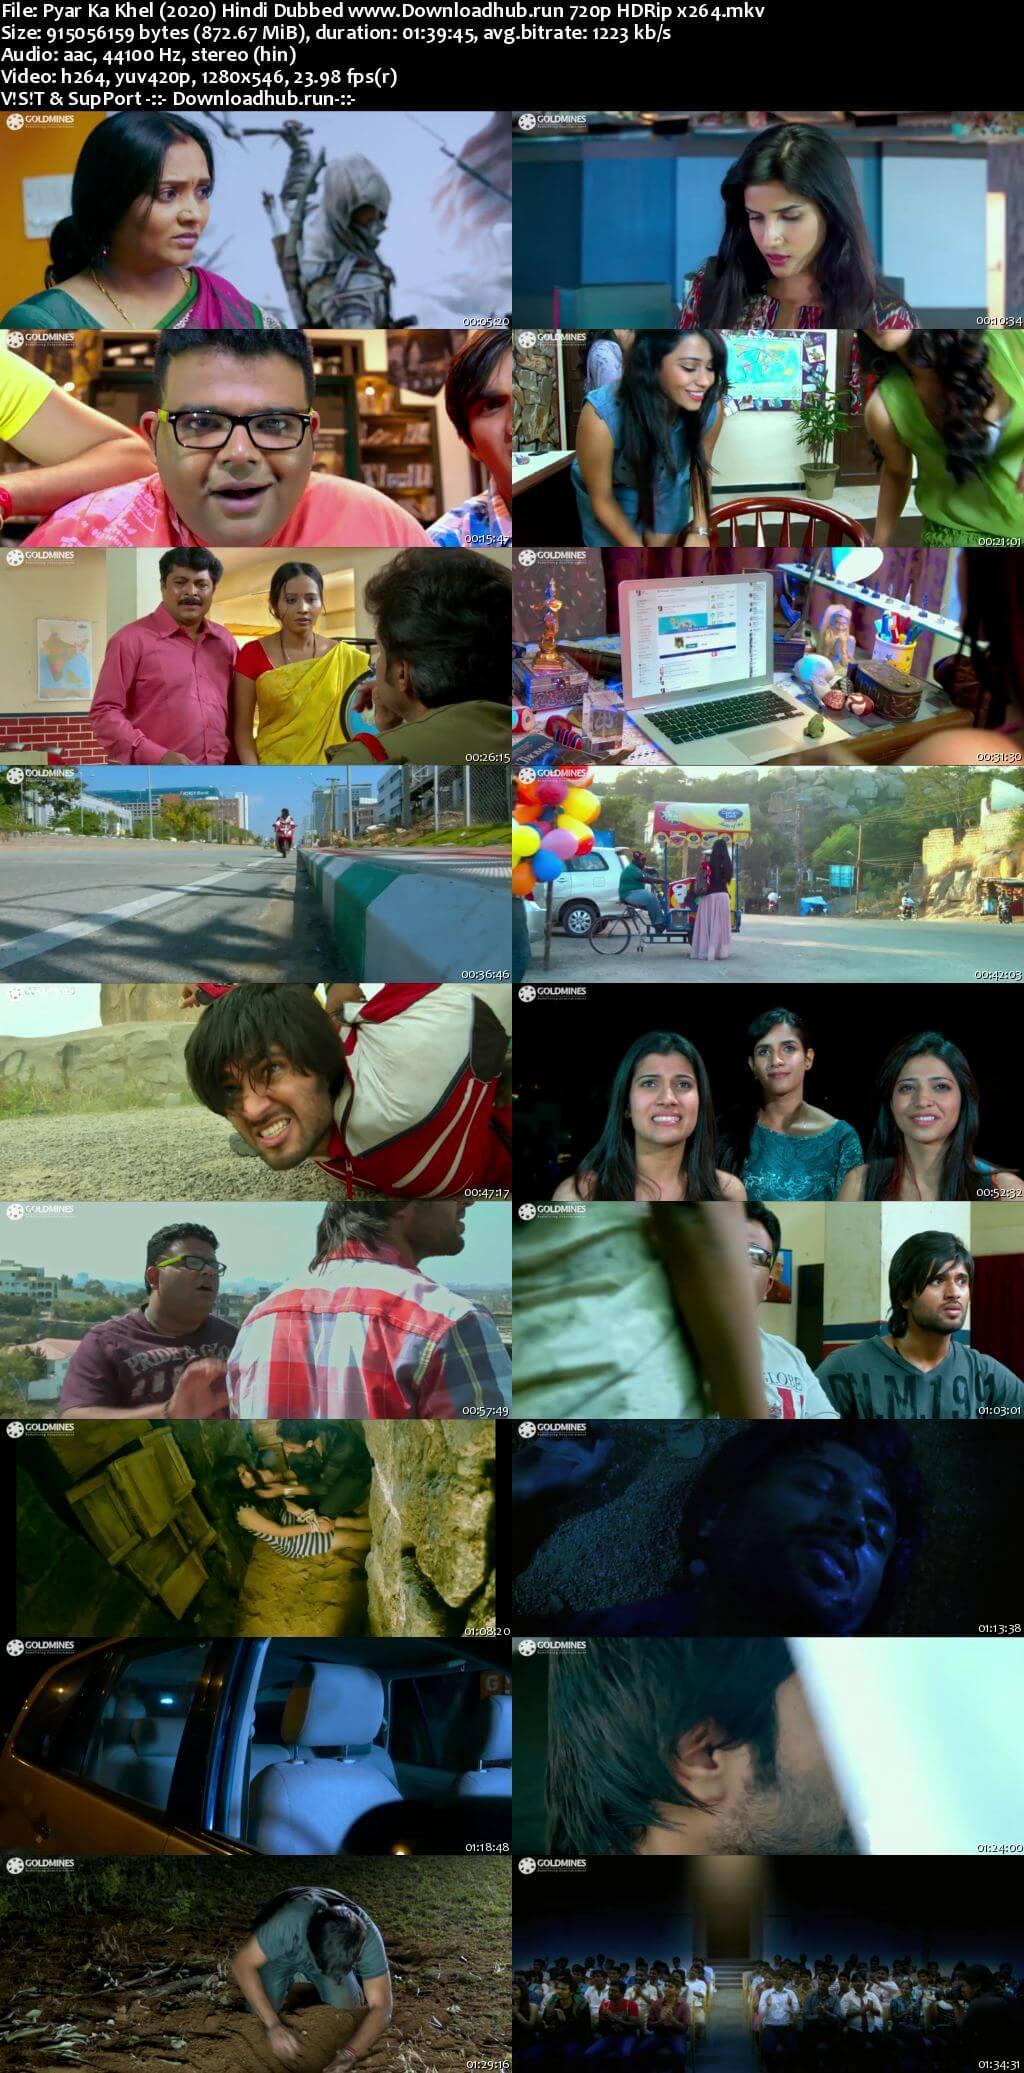 Pyar Ka Khel 2020 Hindi Dubbed 720p HDRip x264